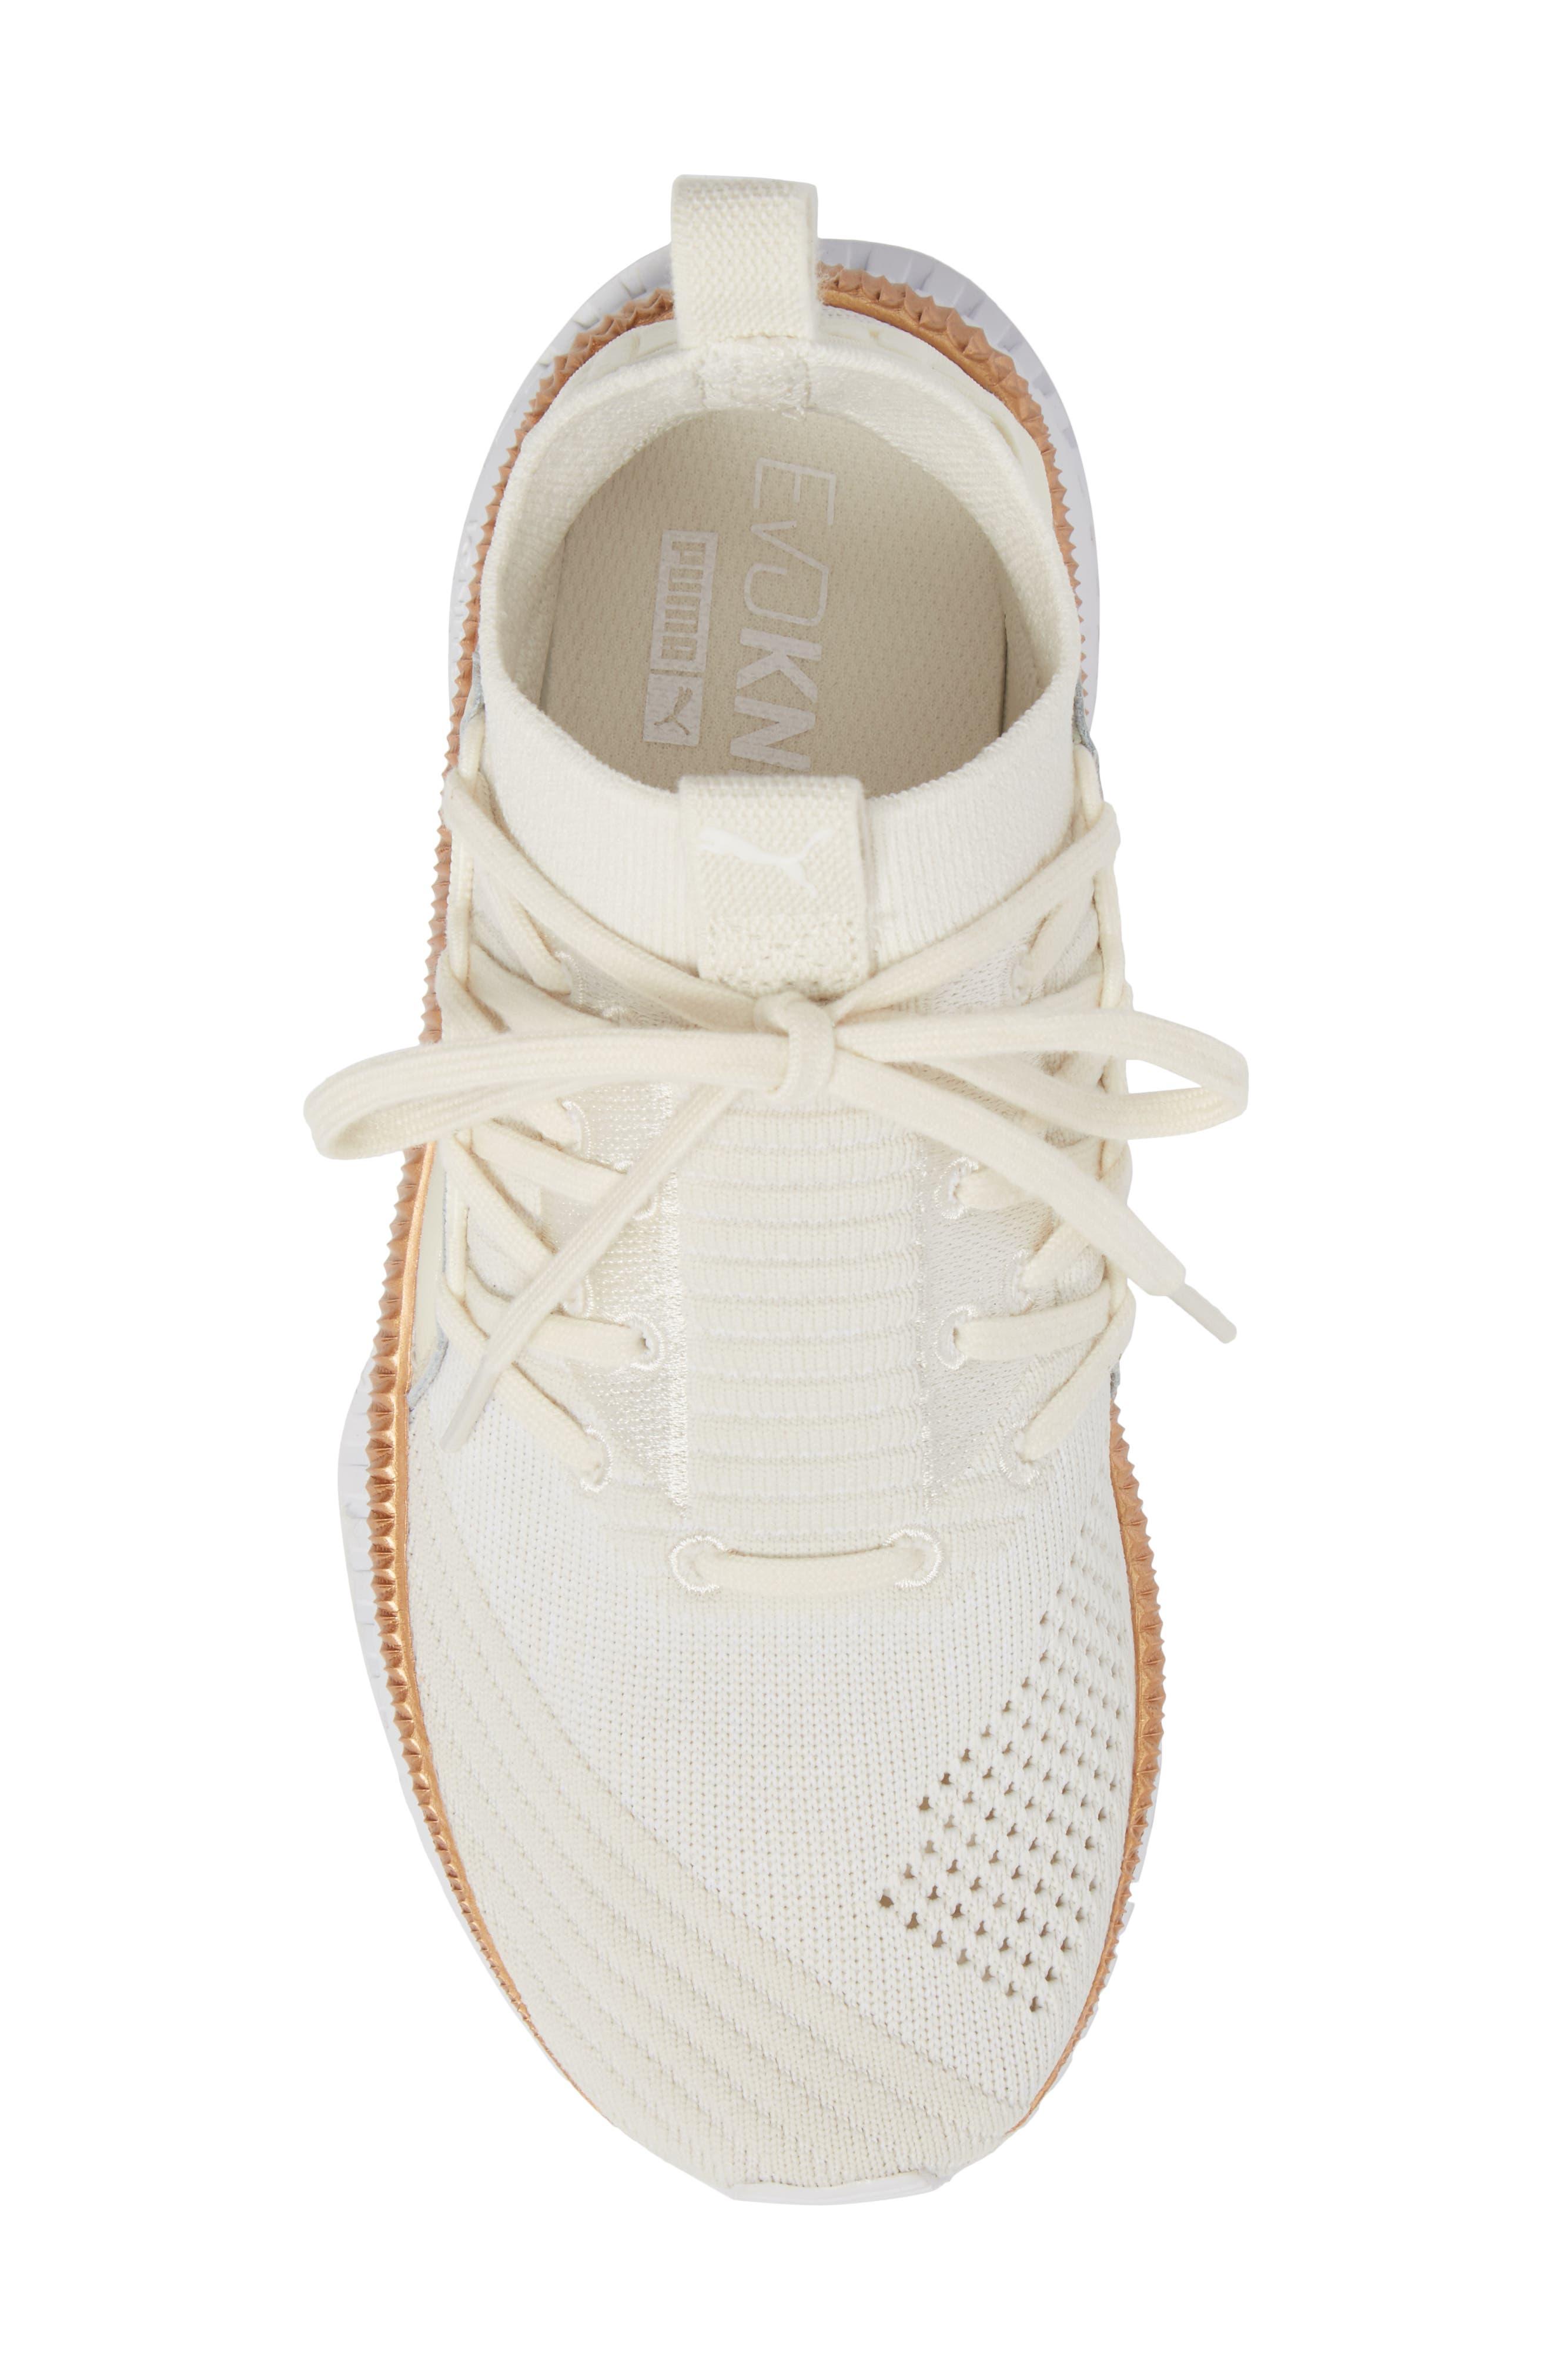 Tsugi Jun Knit Sneaker,                             Alternate thumbnail 33, color,